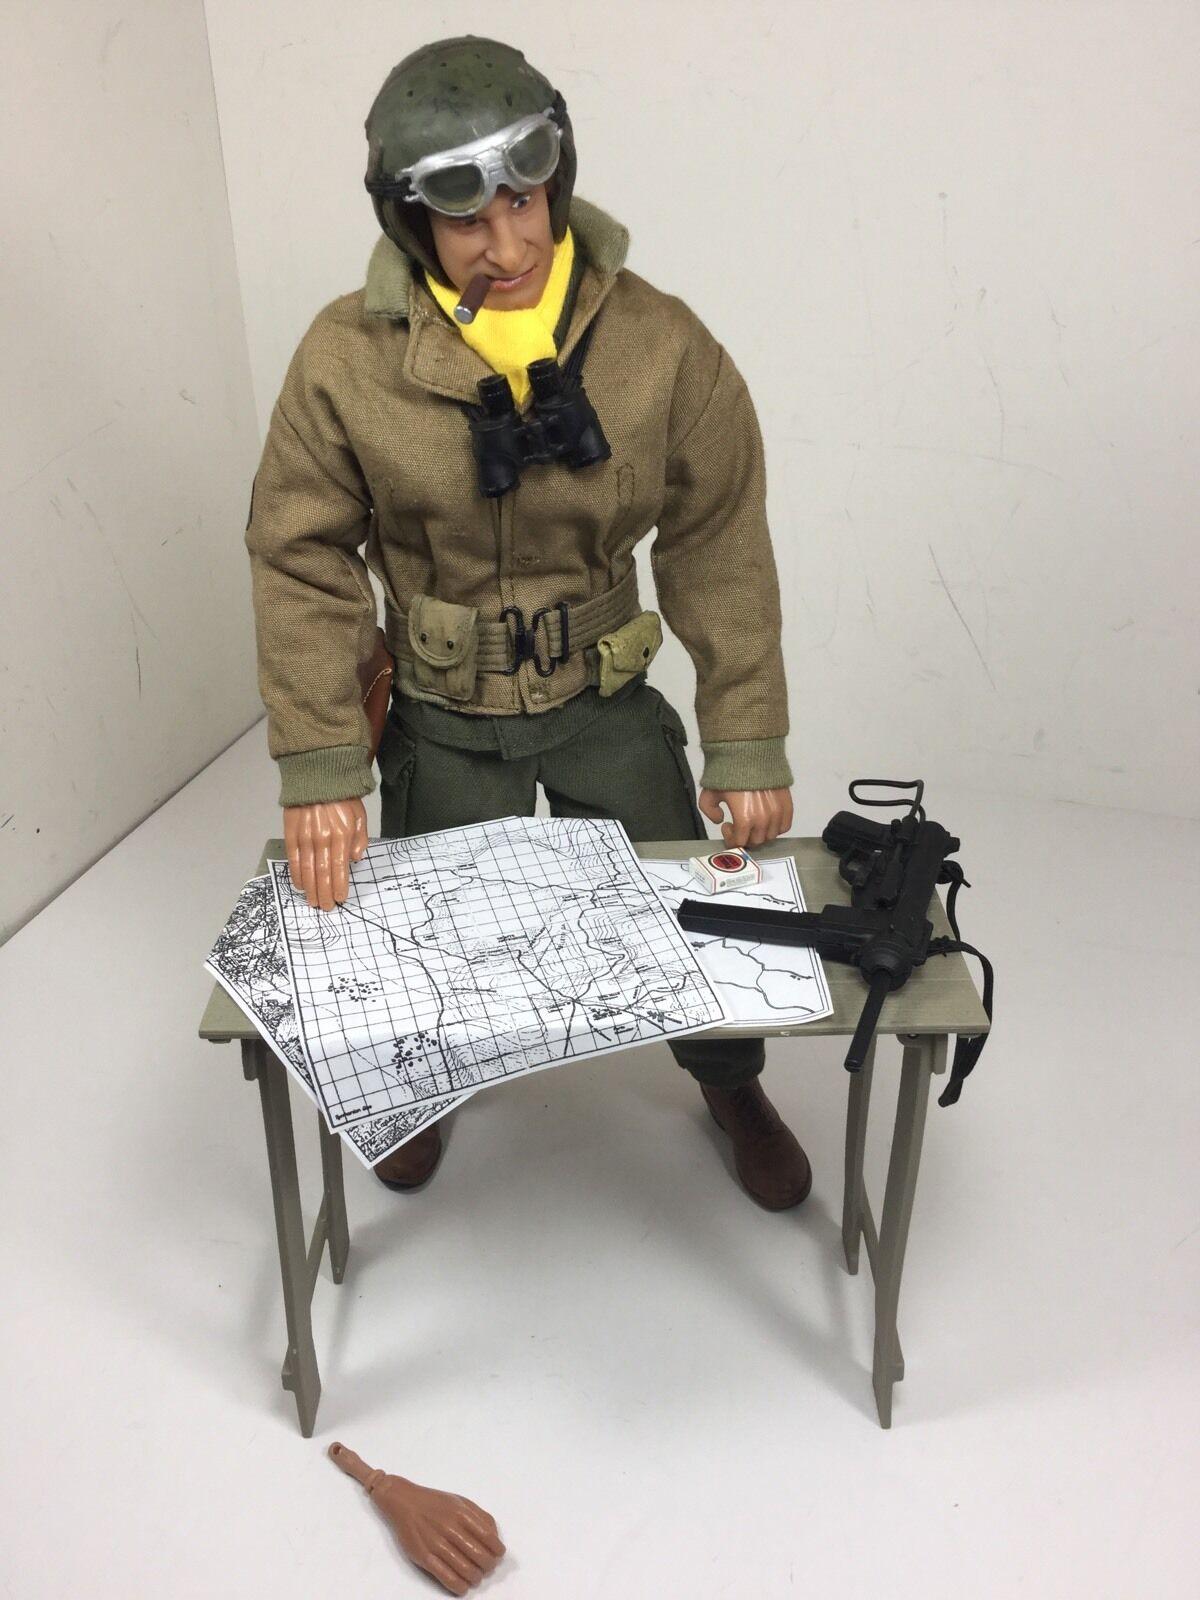 1 6 21ST CENTURY US 4TH ARMORED DIV TANK COMMANDER+TABLE&MAPS WW2 DRAGON BBI DID